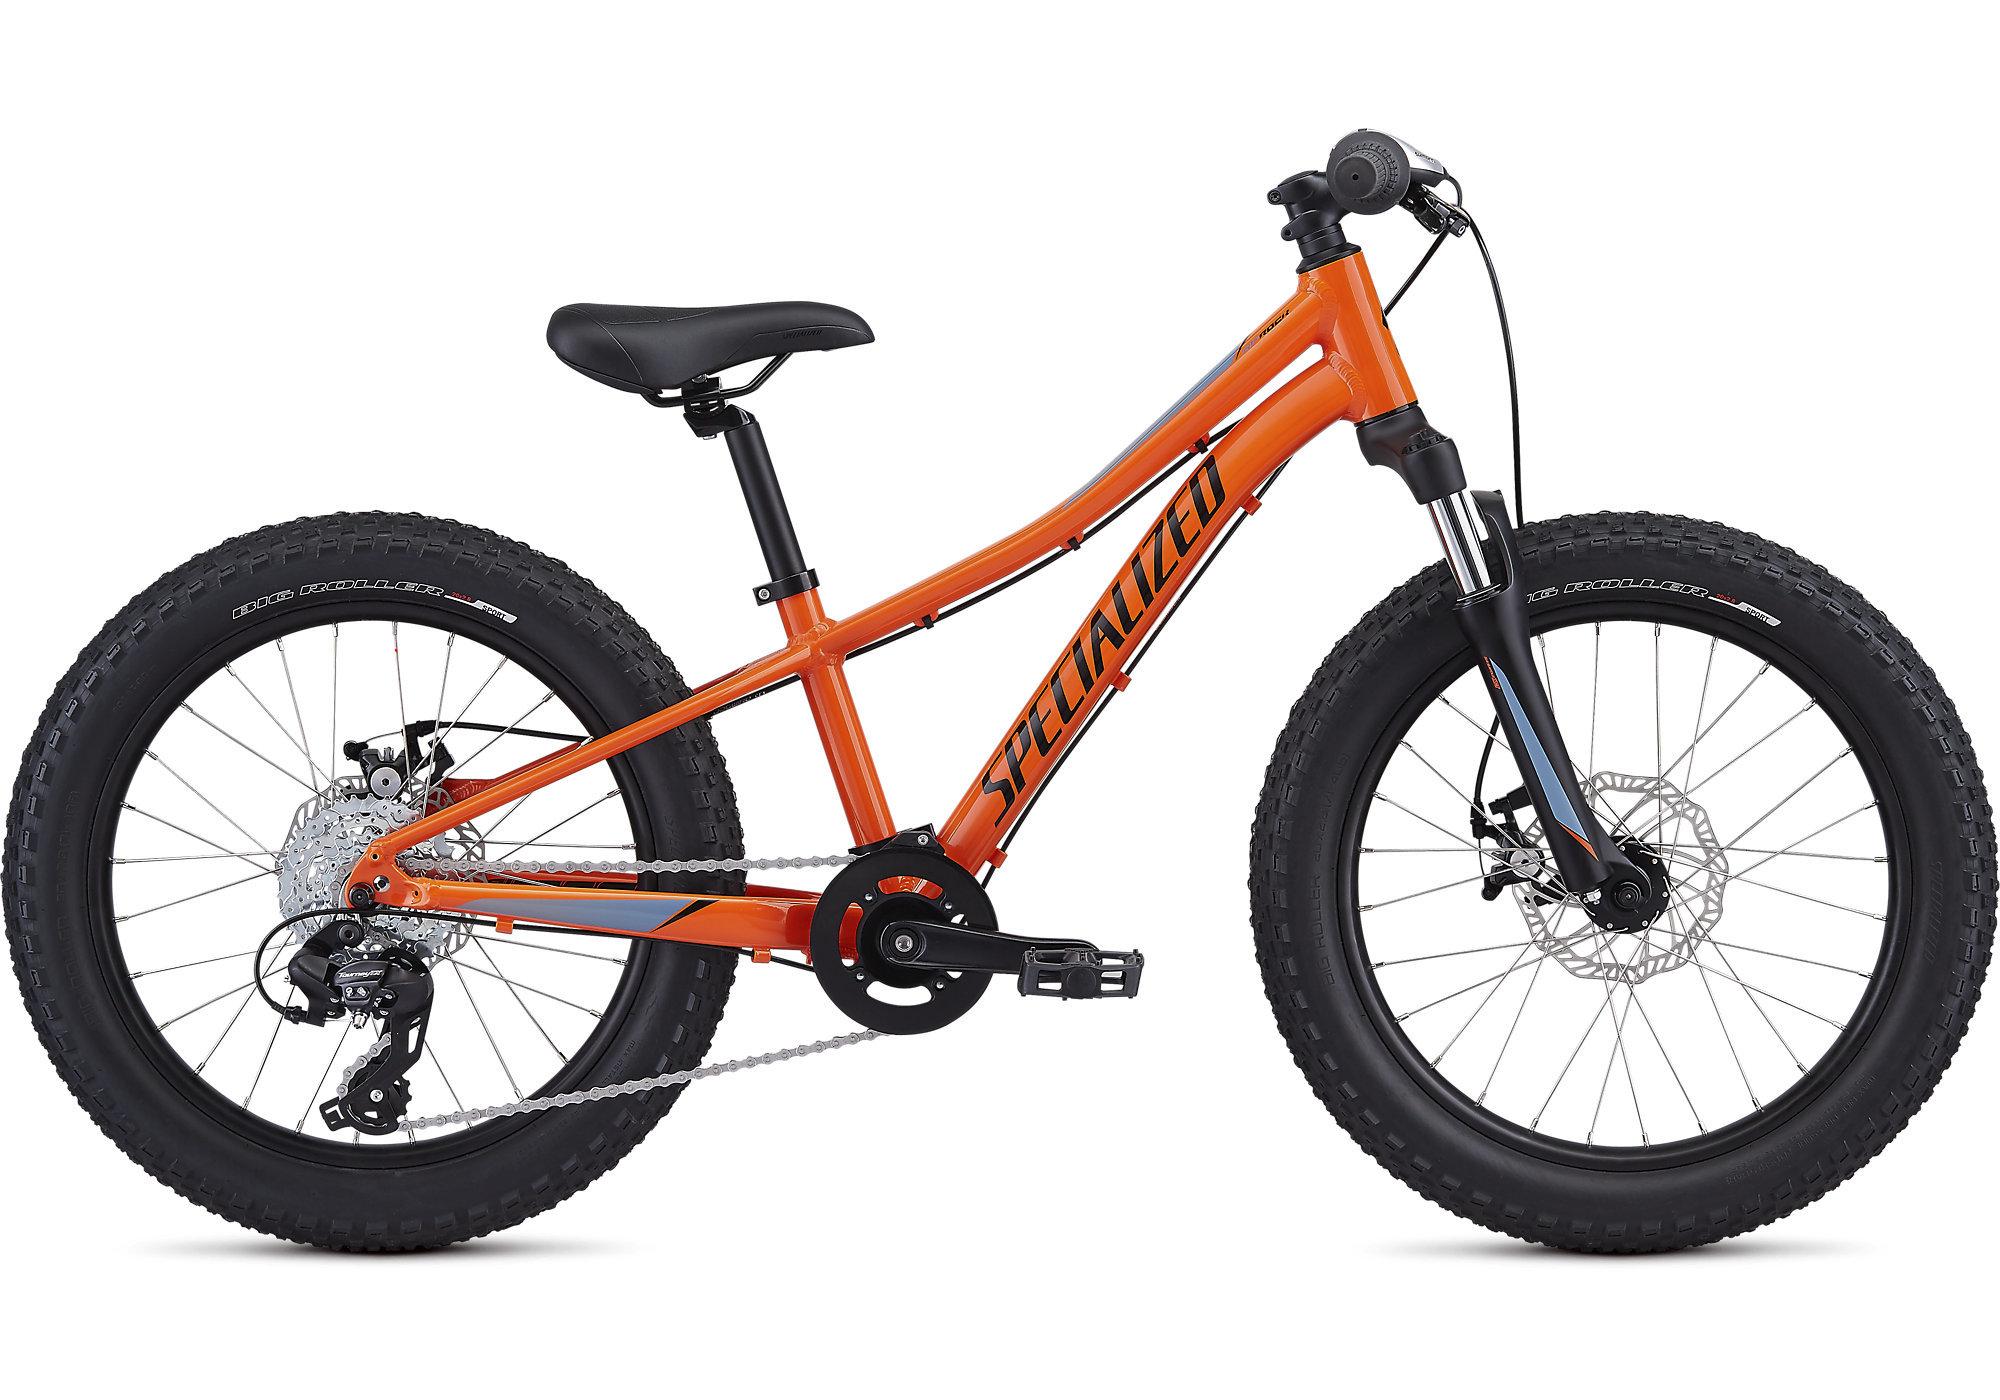 3212d469018 Specialized Riprock 20 - Wheel World Bike Shops - Road Bikes ...